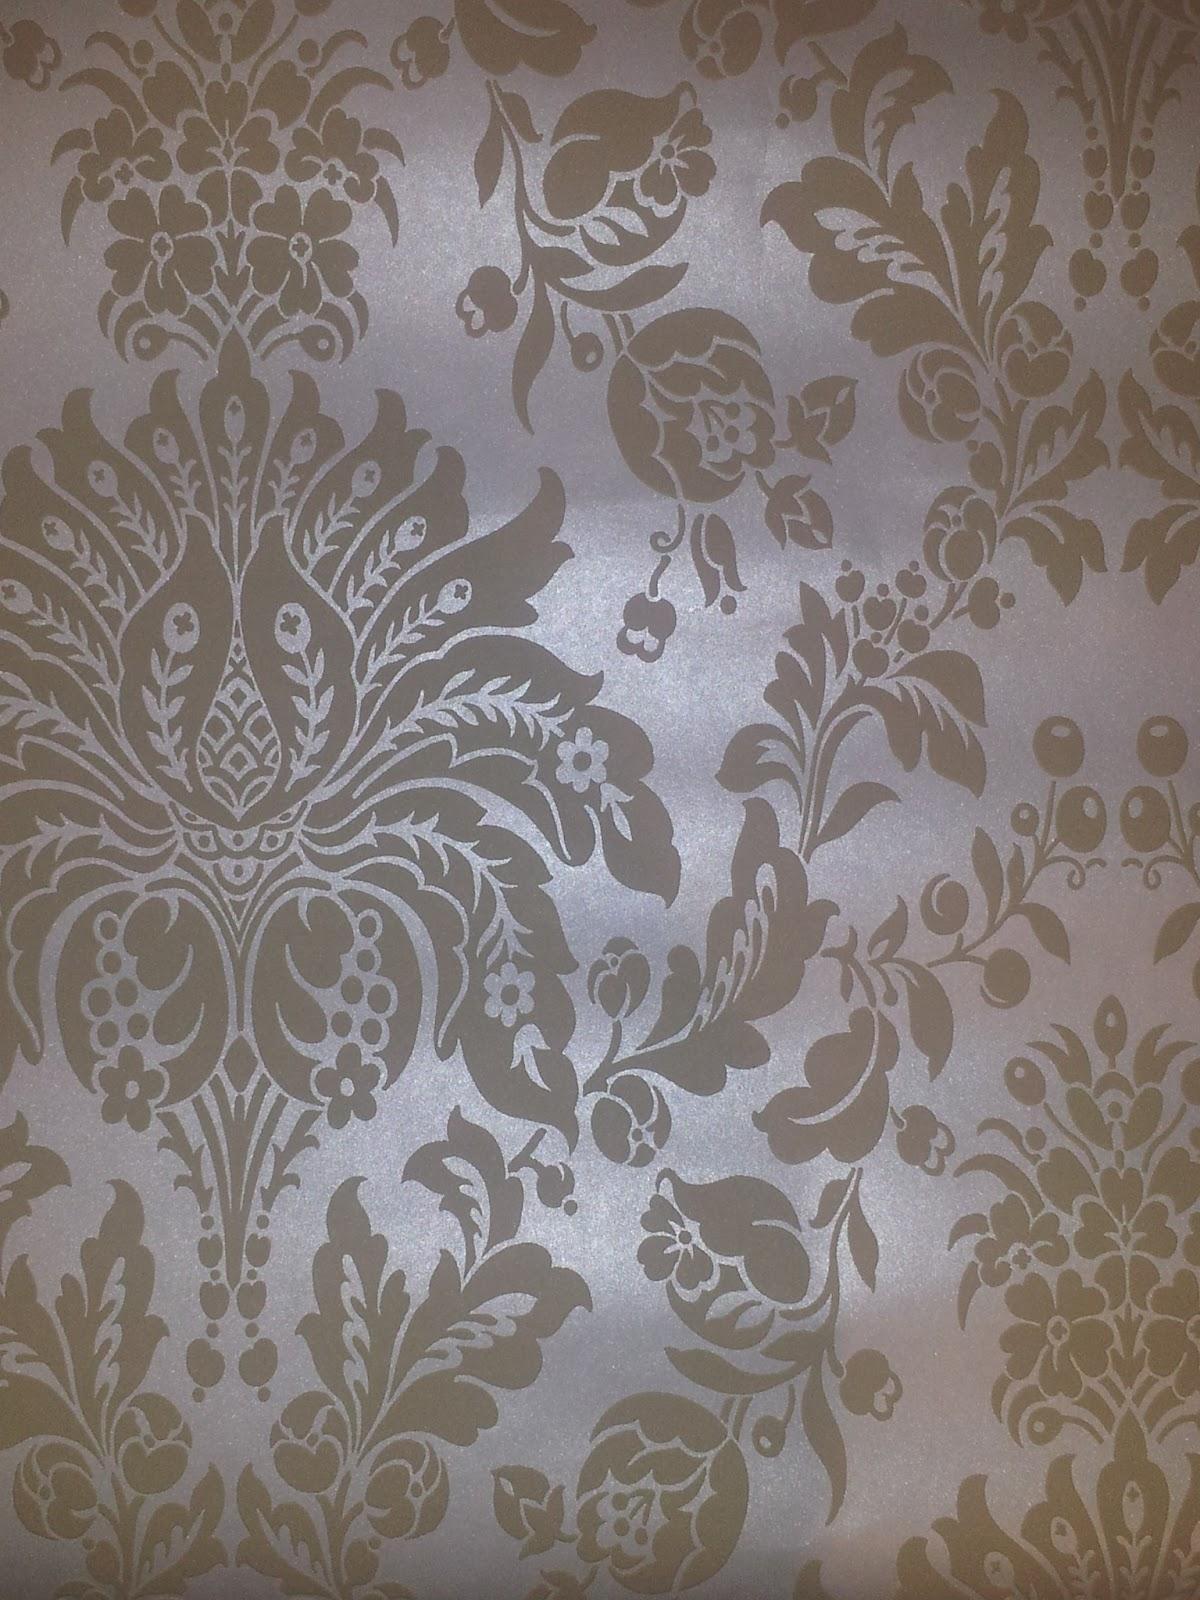 Floral Homebase Wallpaper